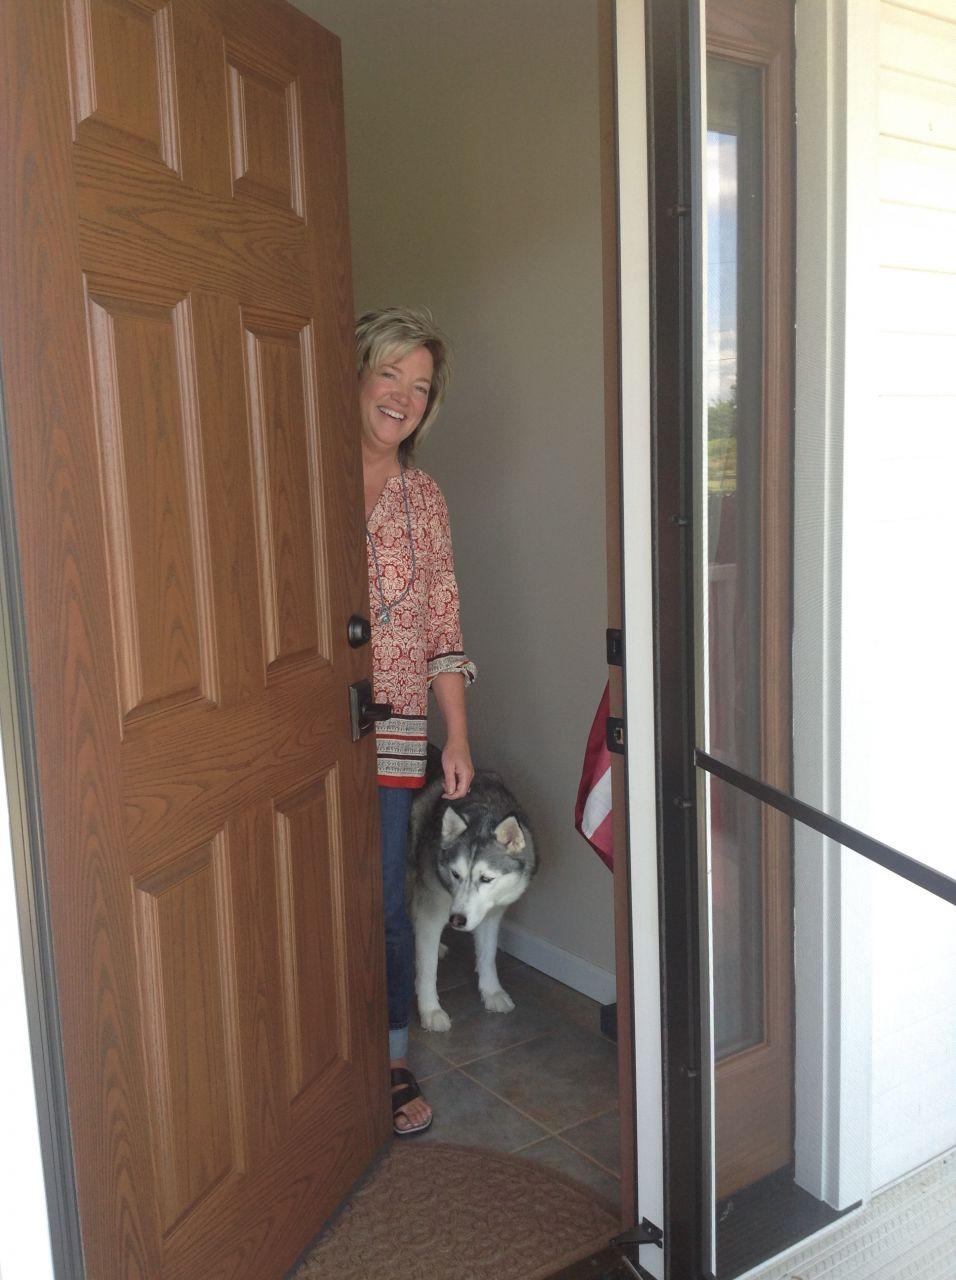 full edmond lite fiberglass star eto modern doors exterior door smooth thermatru medium